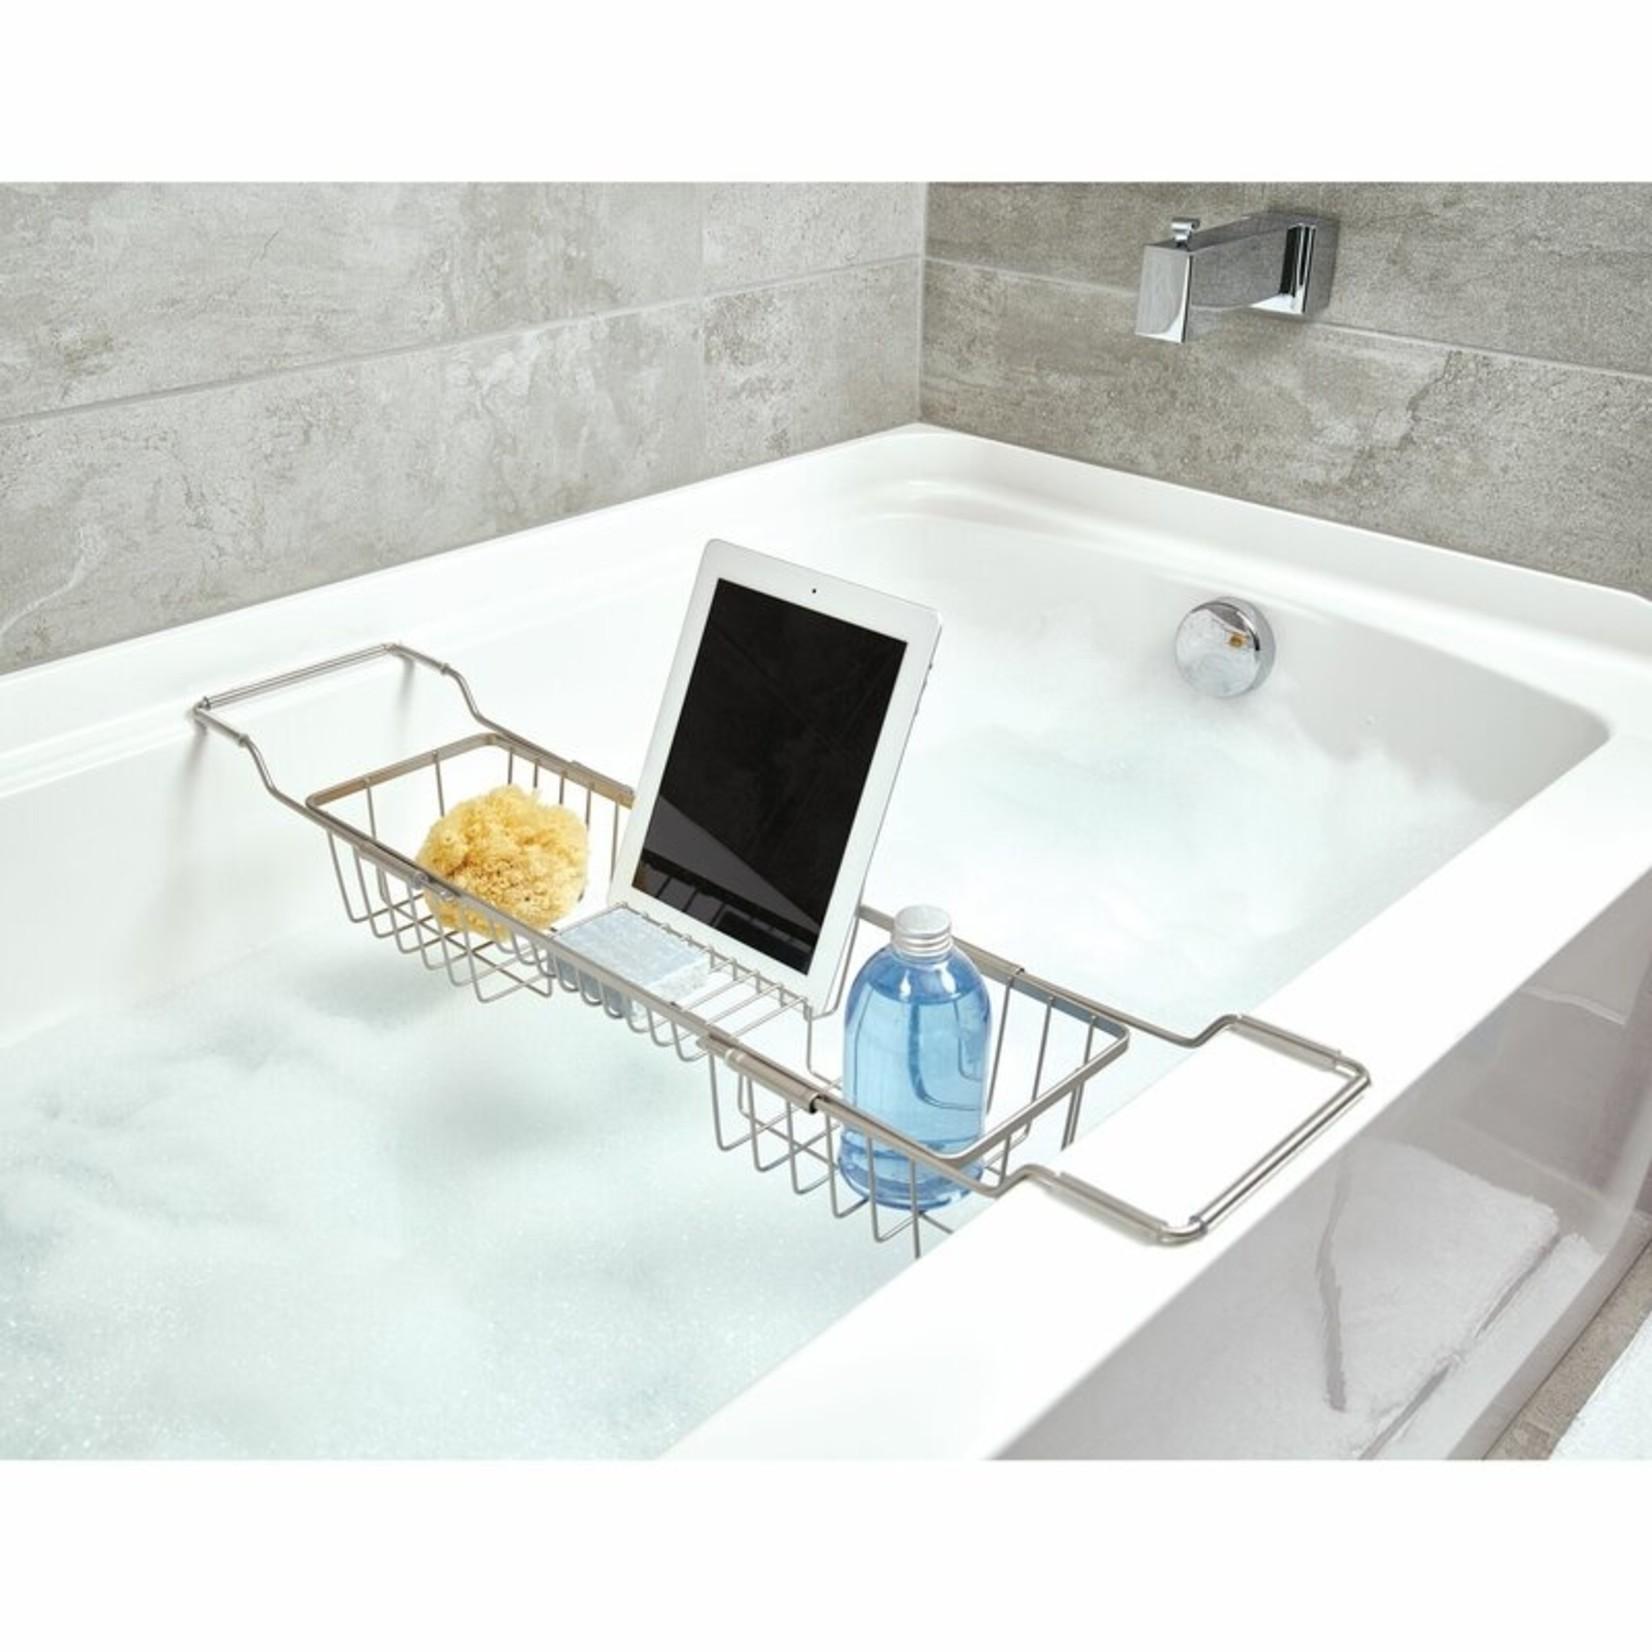 *Everett Adjustable over Bathtub Caddy